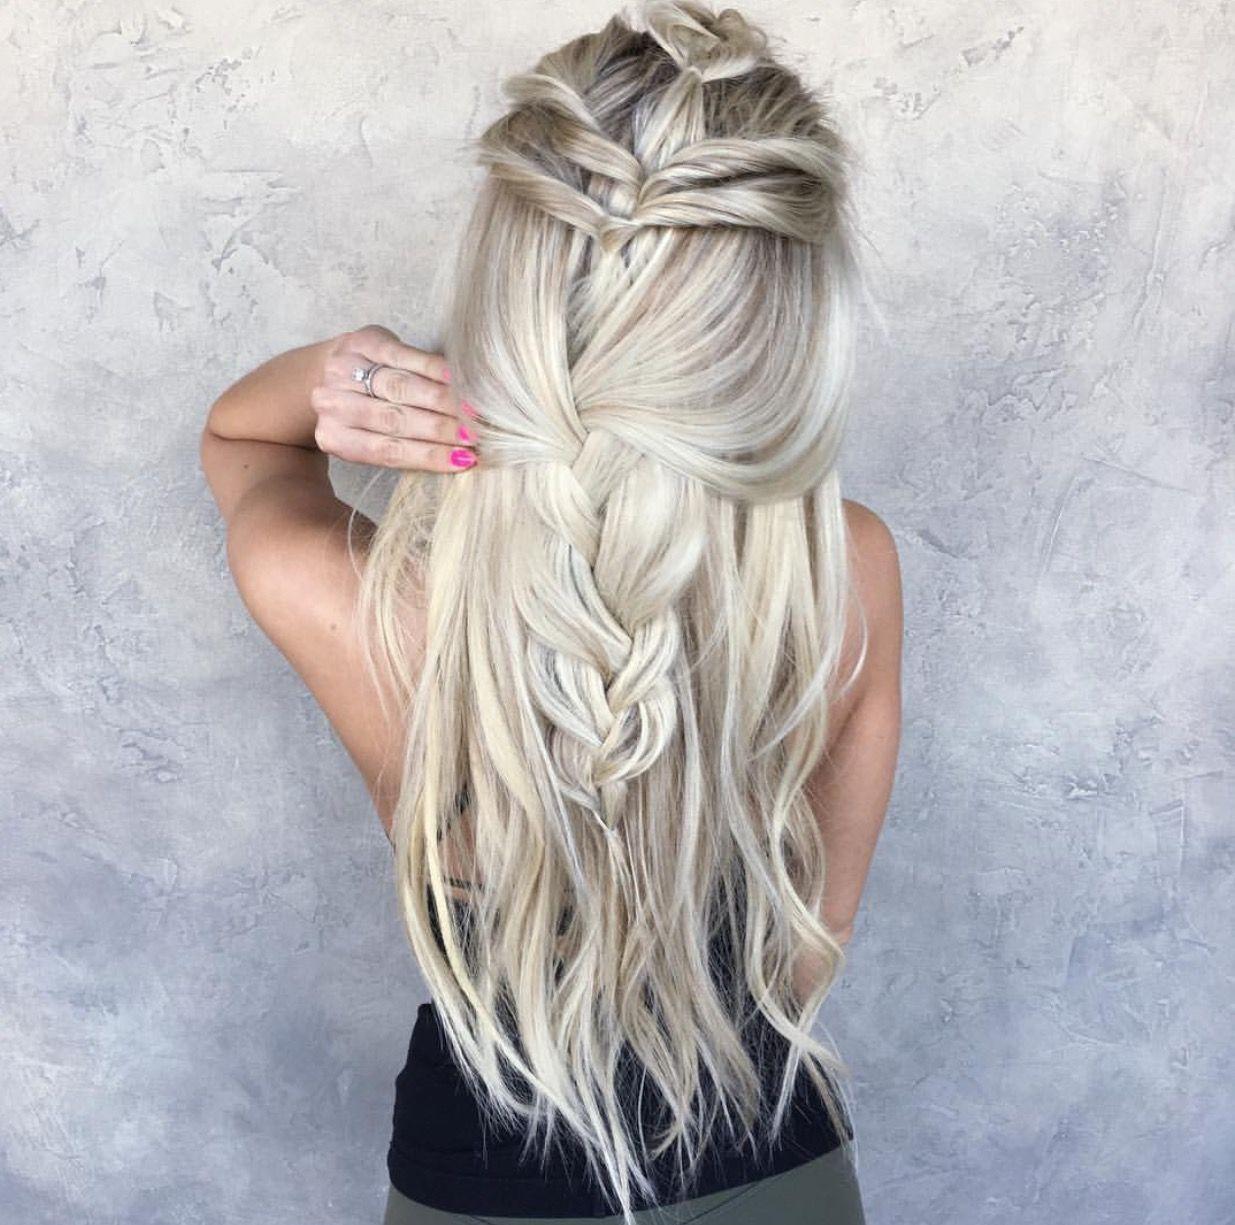 Pin by lourdes on häirstyle pinterest hair style hair